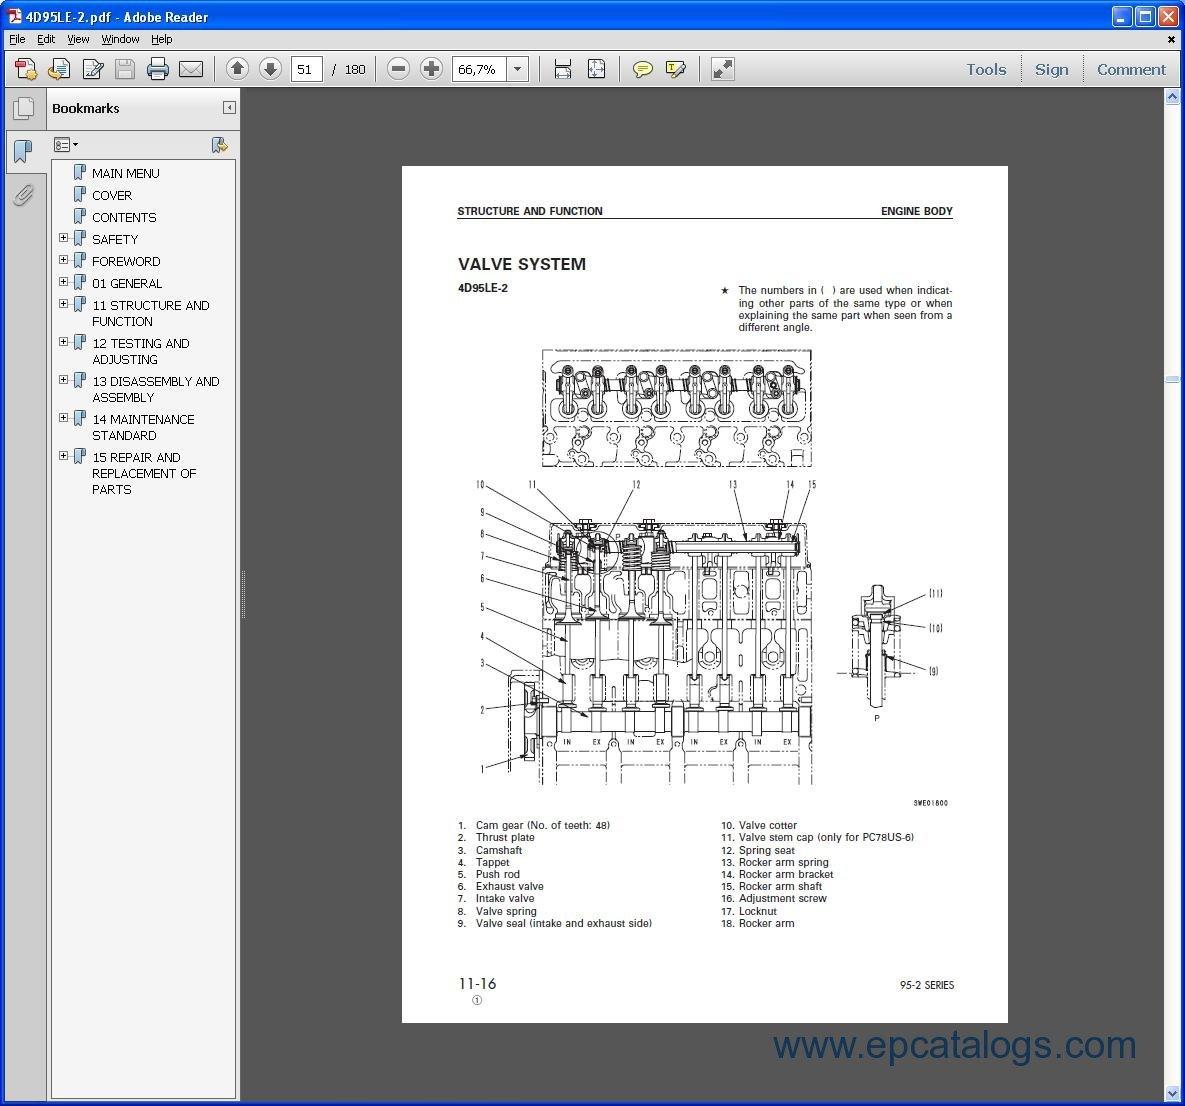 casio sf 6300 digital diary 1994 repair manual parts list